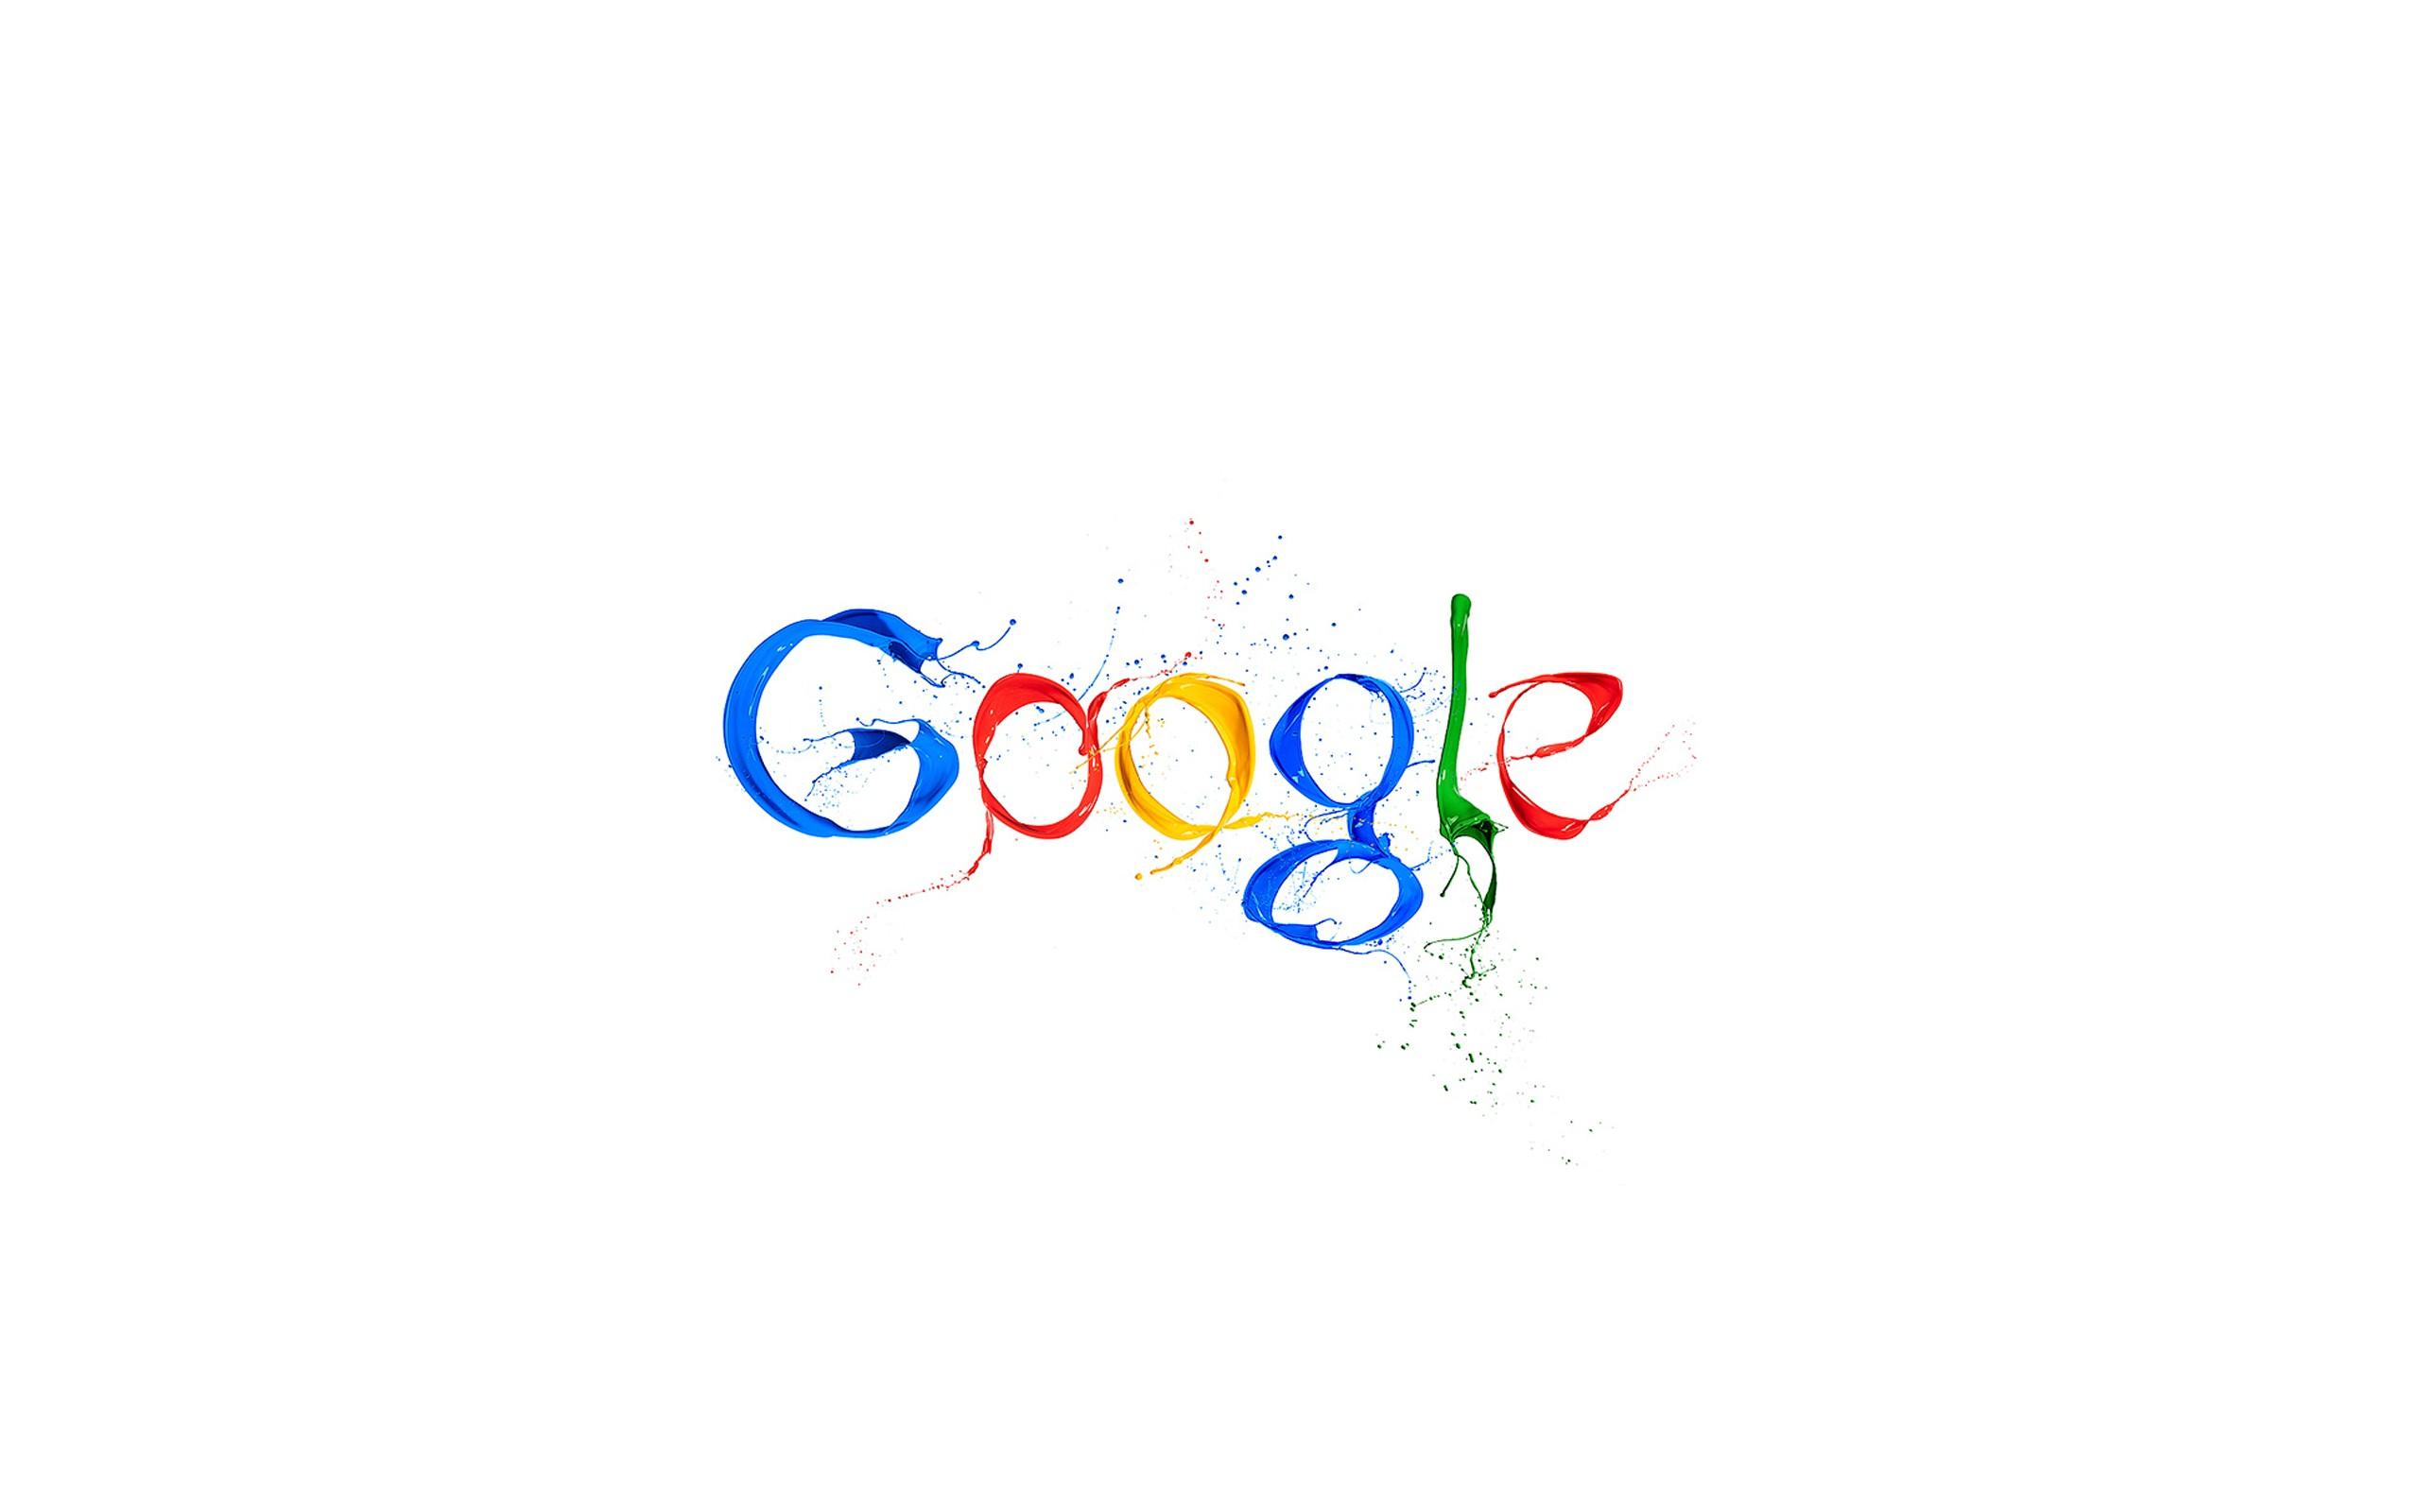 Google nuevo logo - 2560x1600